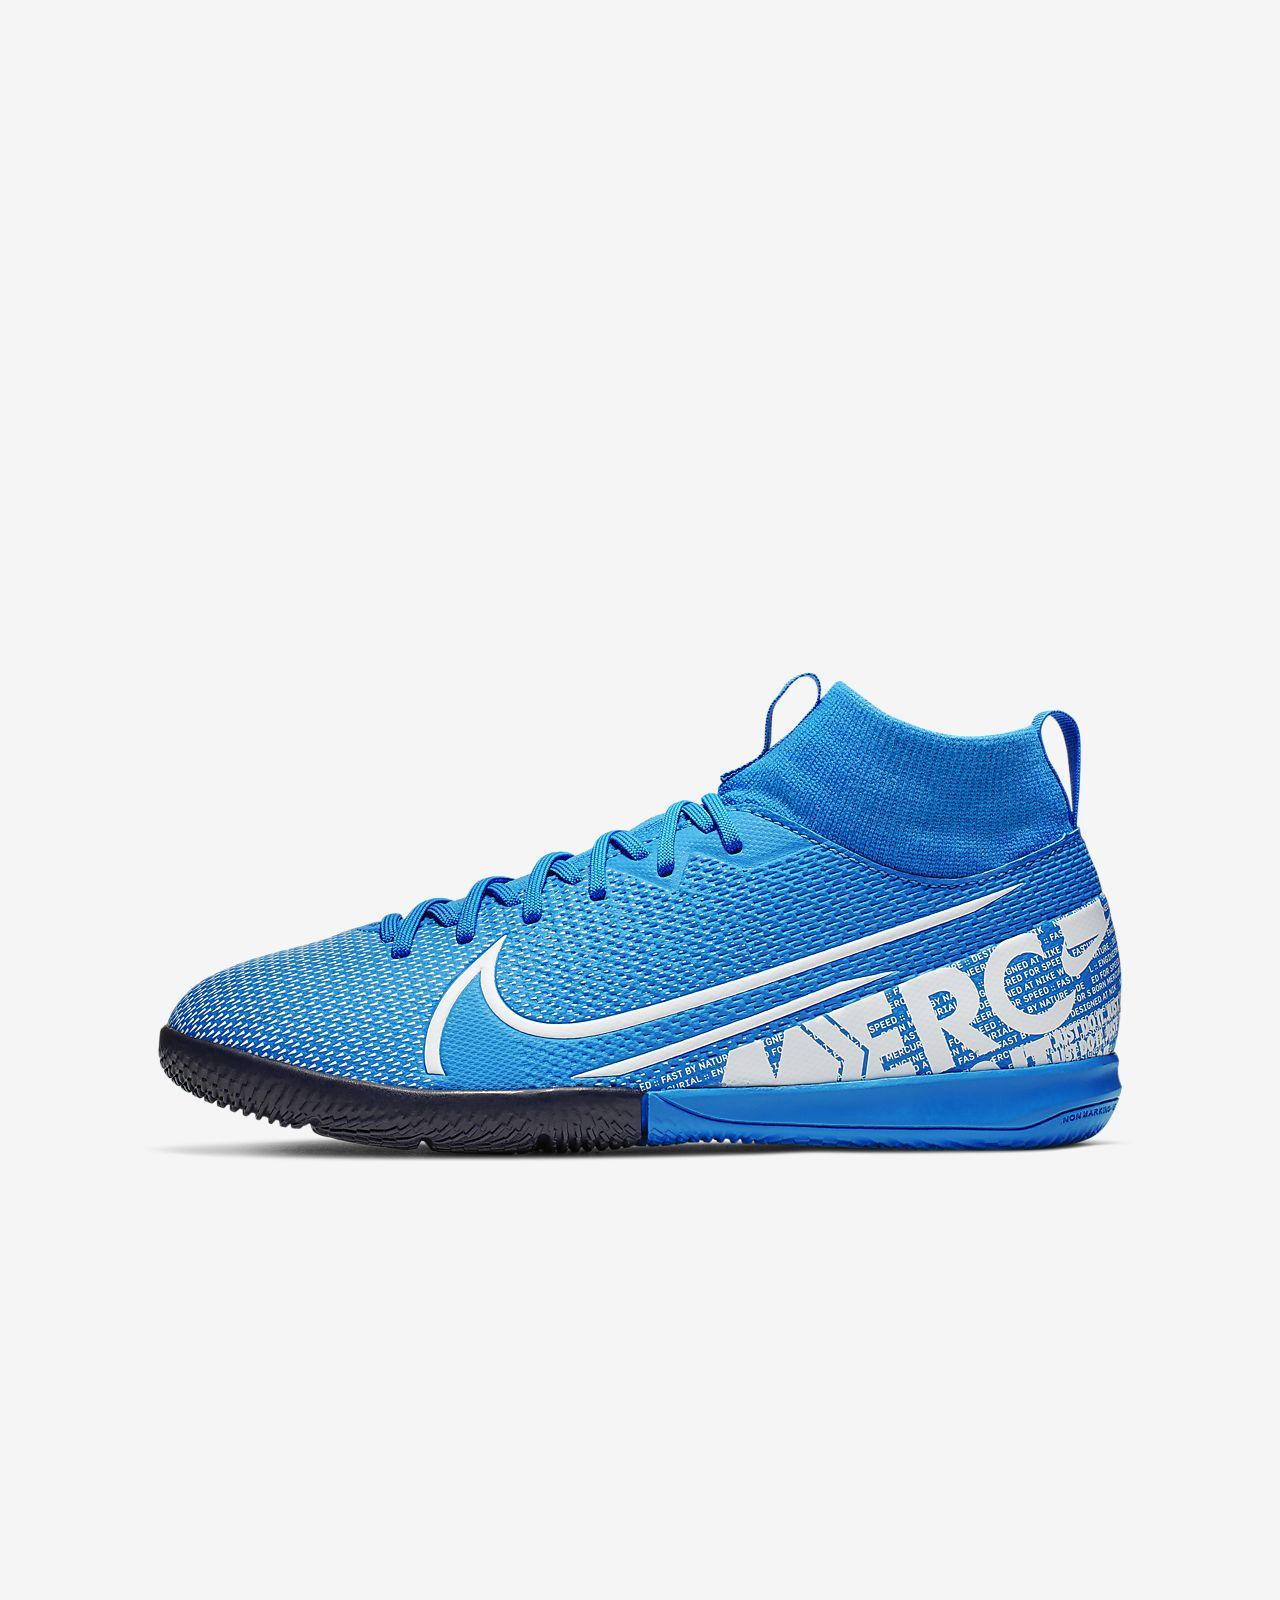 Ic En Superfly Enfant JrMercurial 7 Academy Pour De Chaussure Salle Football Nike 5R3AcLj4q